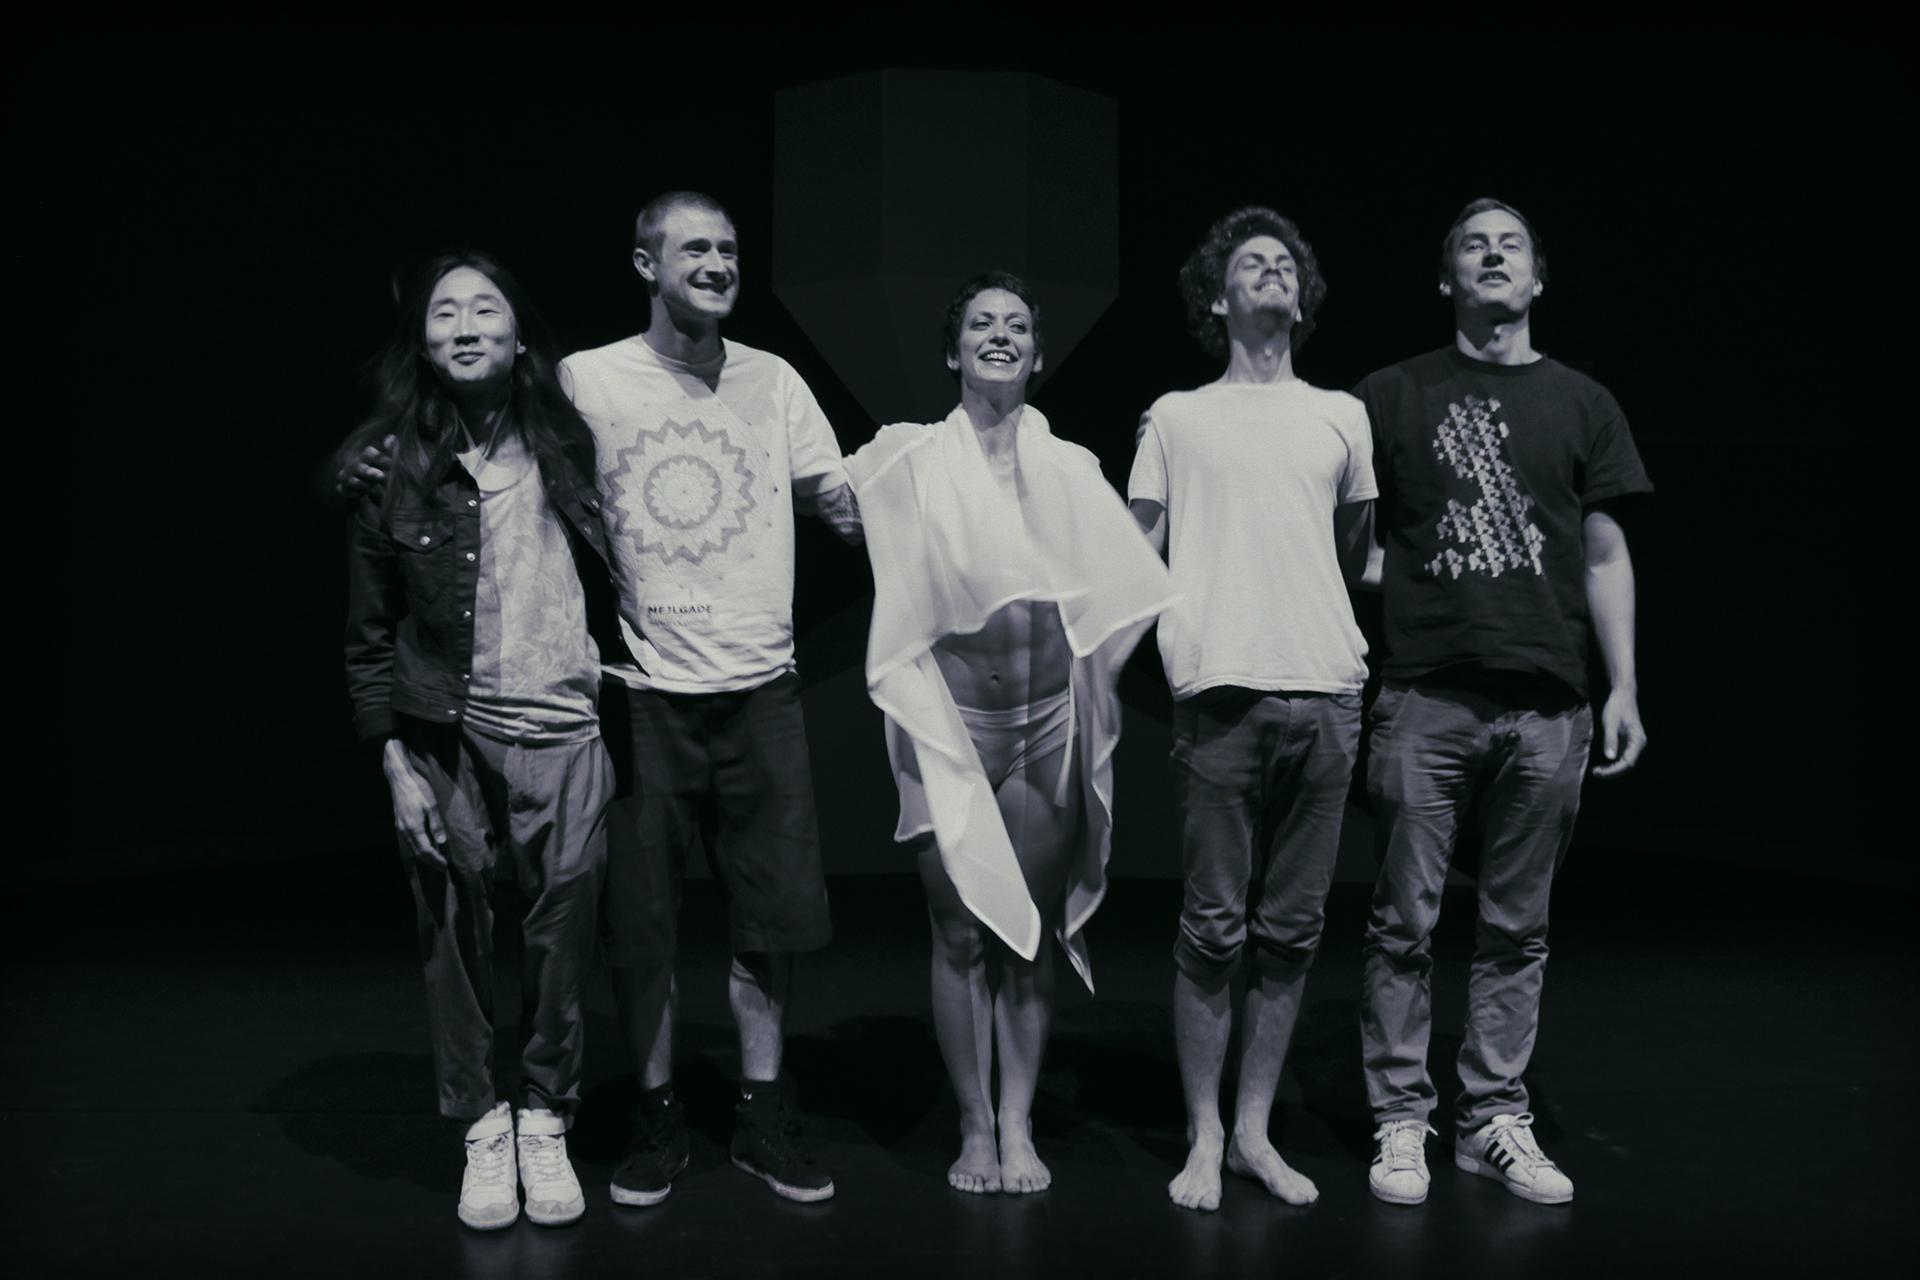 Troels Primdahl, Kristian Madsen, Vittoria Lasorella, Filip Johan Arnestad, Kristian Schwarz